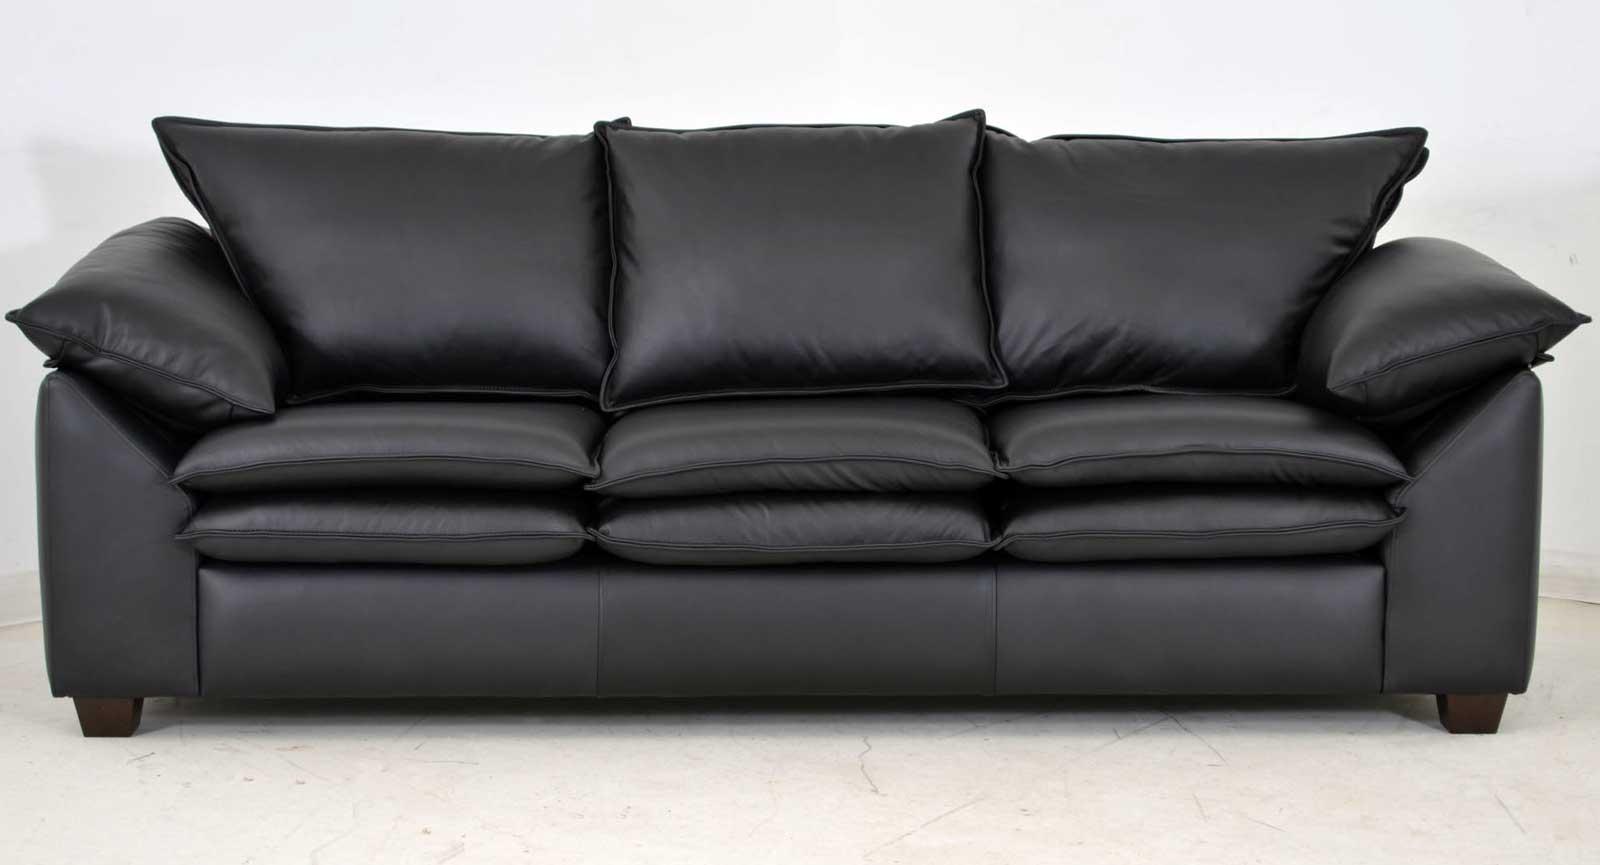 Three Cushion Sofa Black